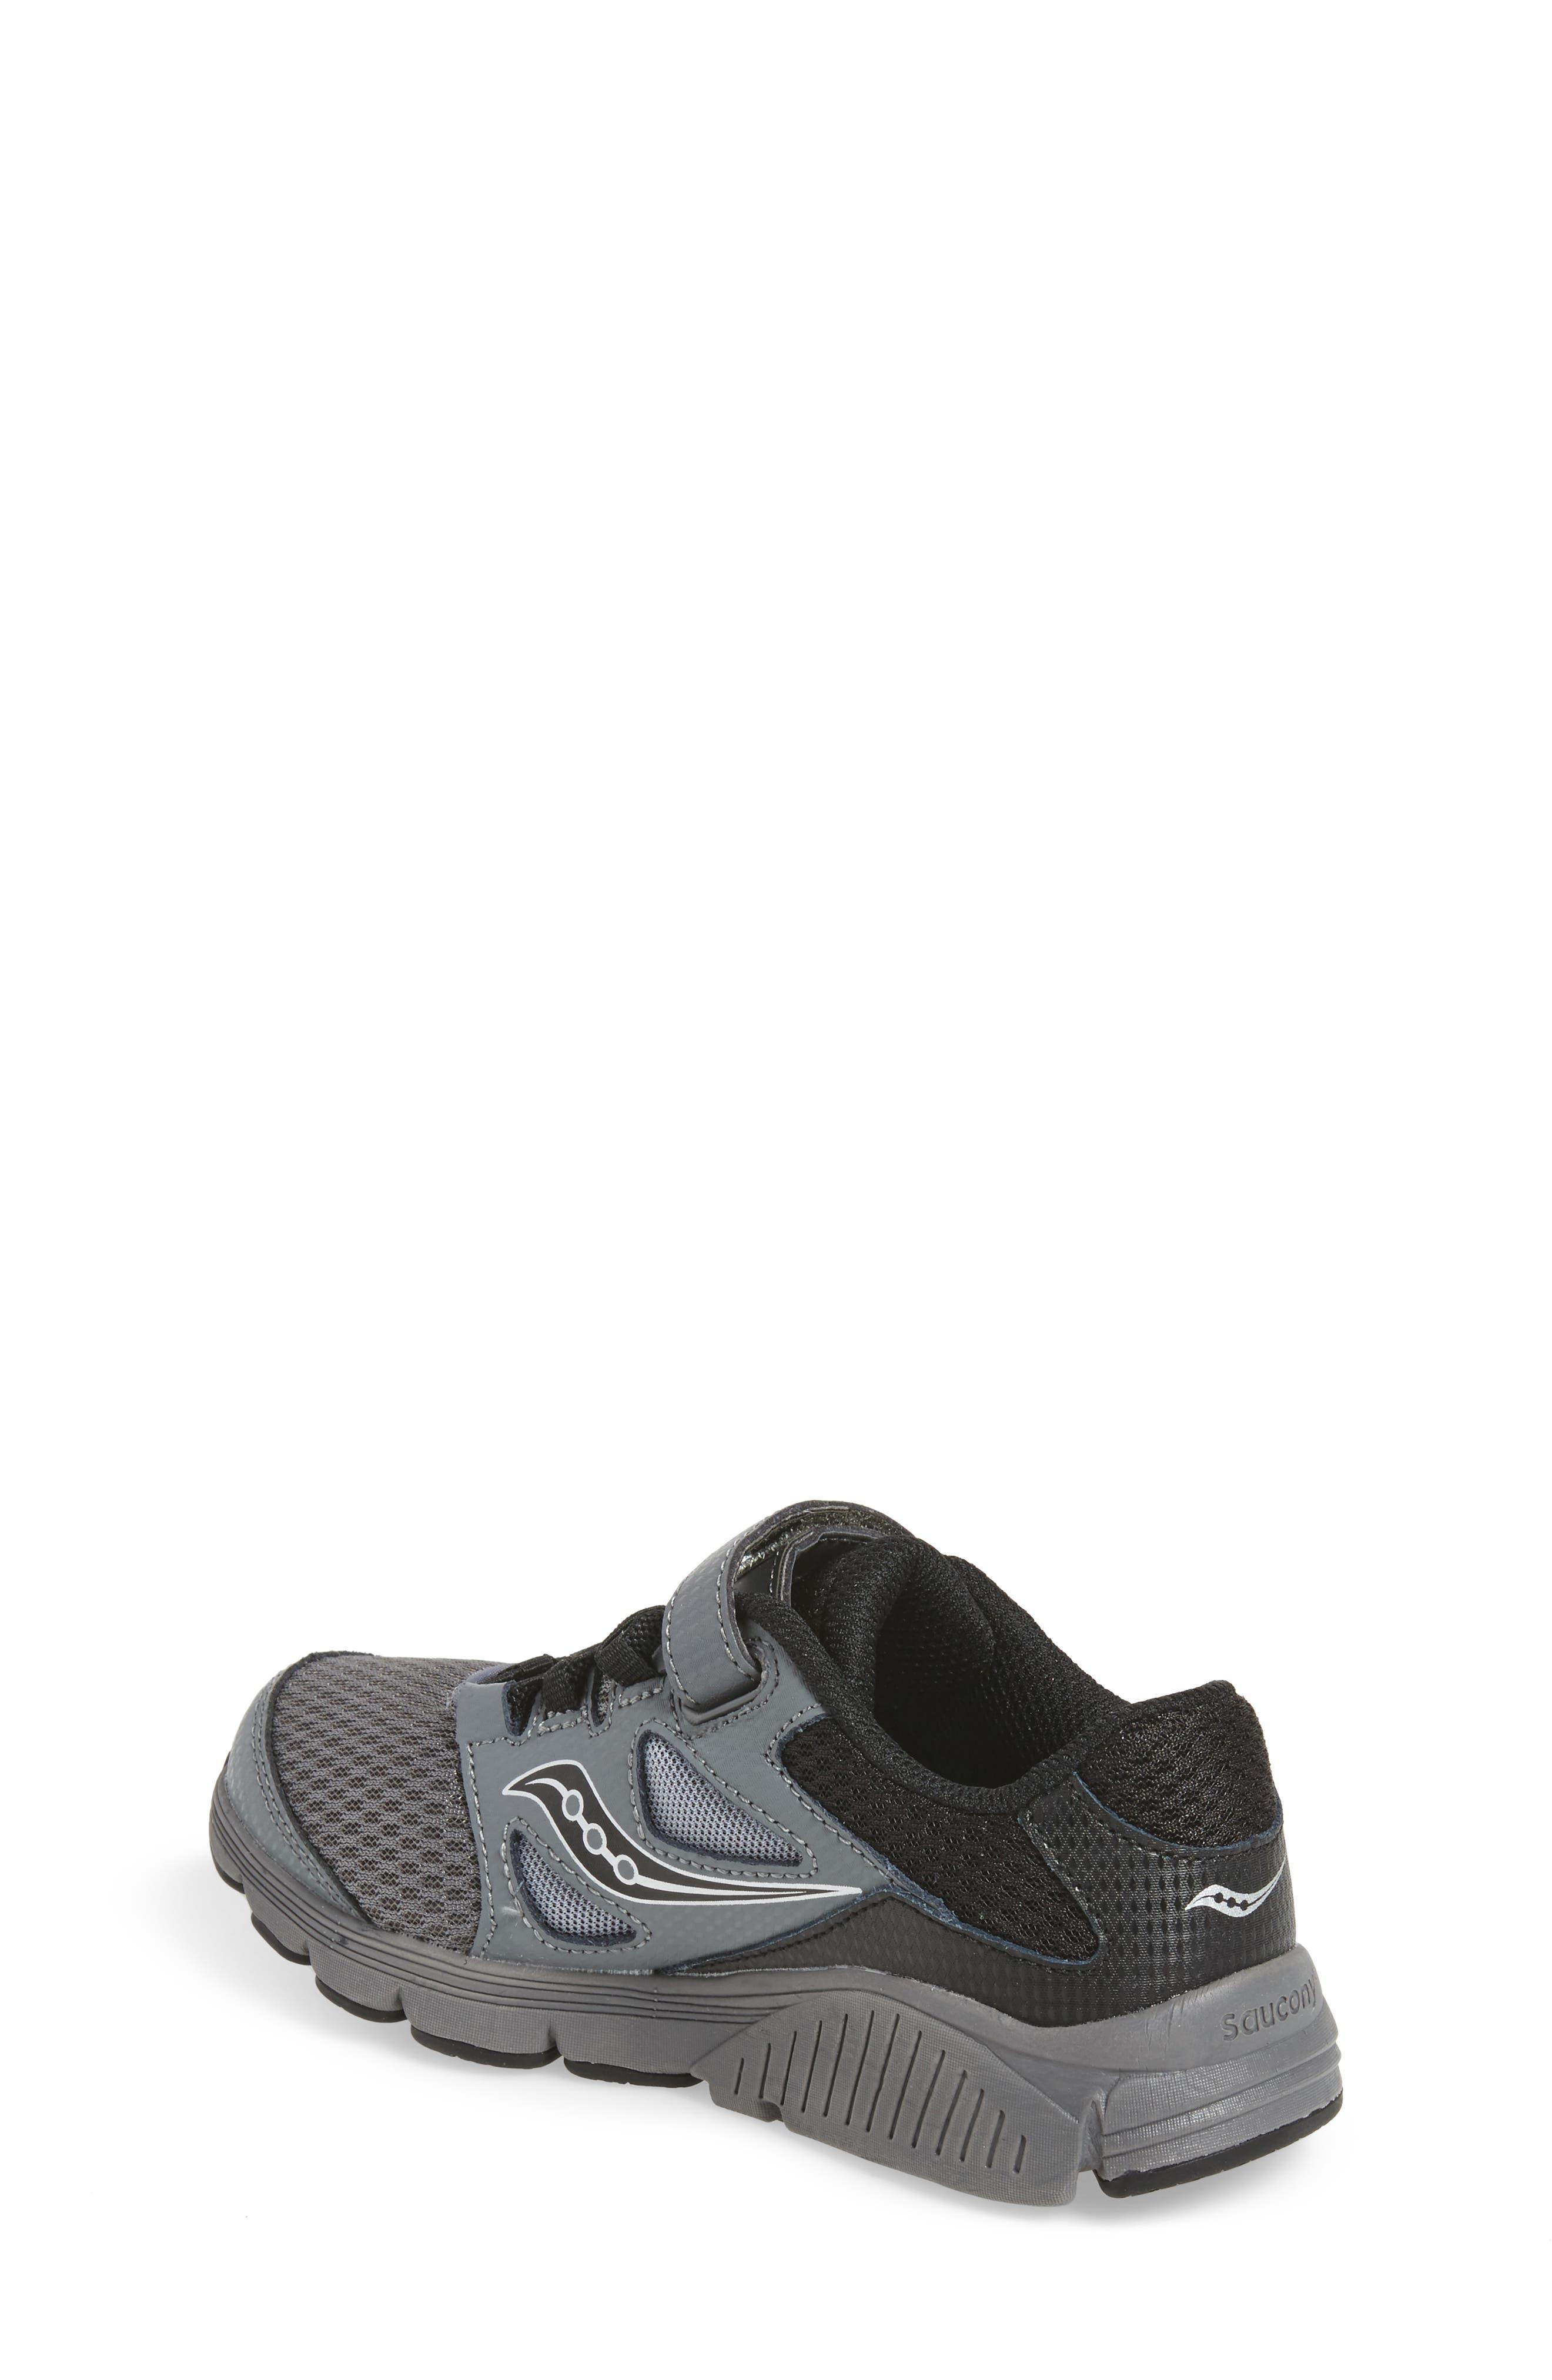 Kotaro 4 A/C Athletic Sneaker,                             Alternate thumbnail 2, color,                             021